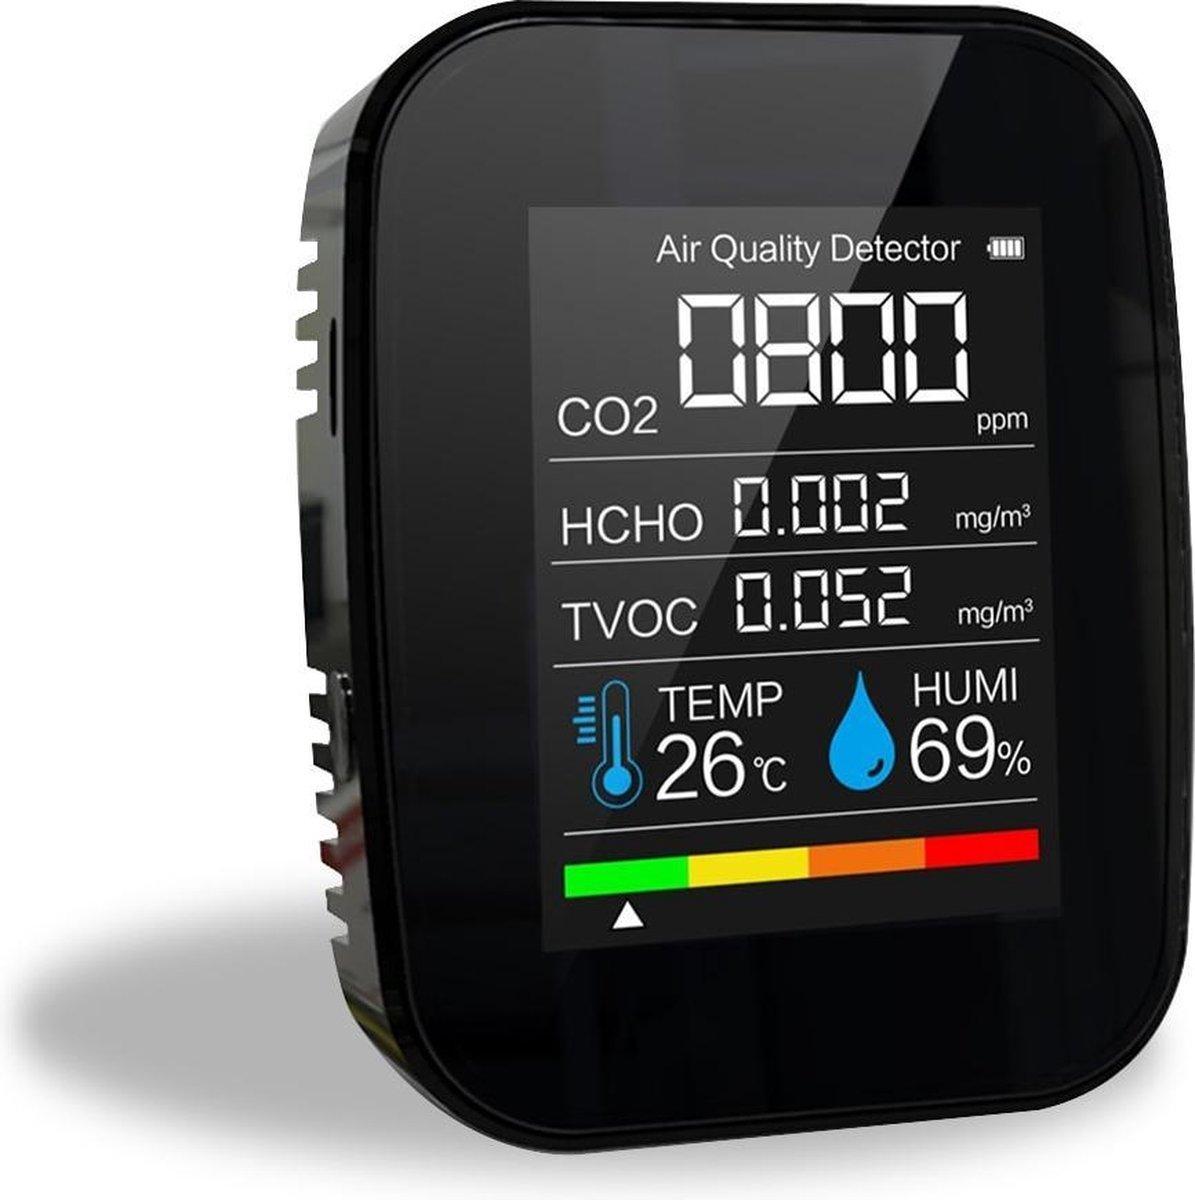 Horeca. 5 in 1 Luchtkwaliteitmeter Draagbaar LCD Scherm Monitor CO2 TVOC HCHO TEMP HUMI - Luchtvocht